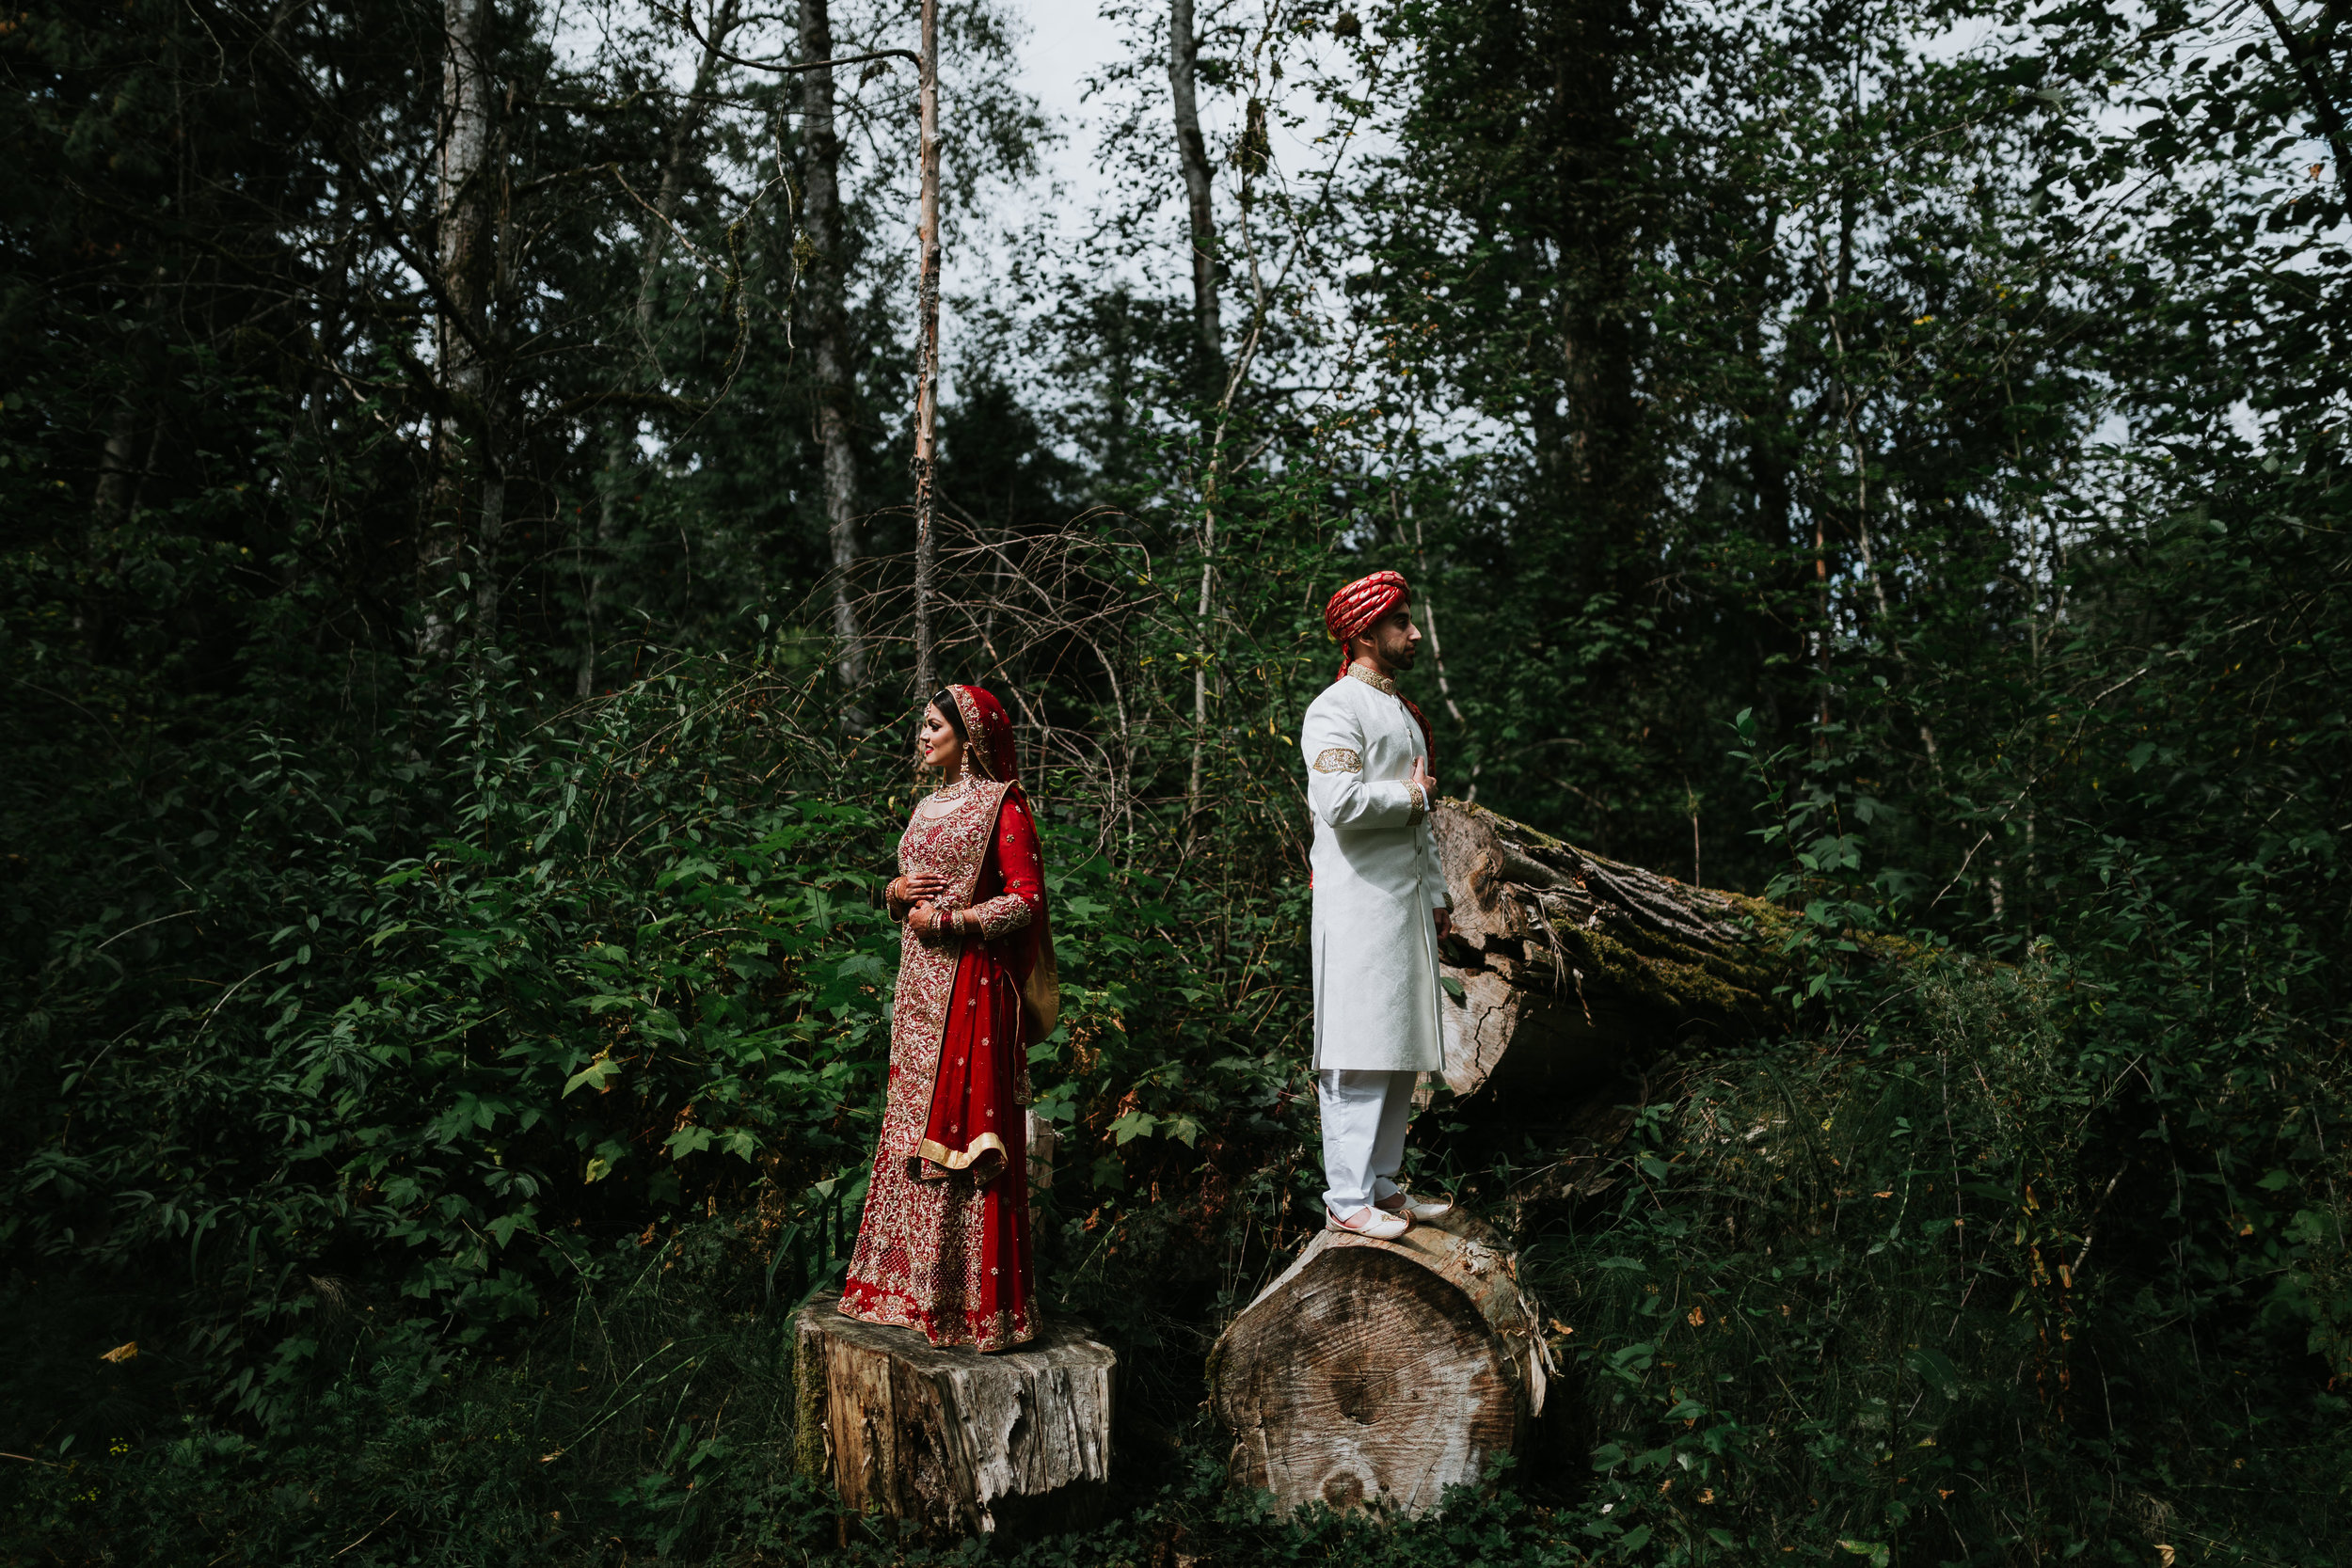 pakistani-vancouver-surrey-wedding-photographer-04.jpg